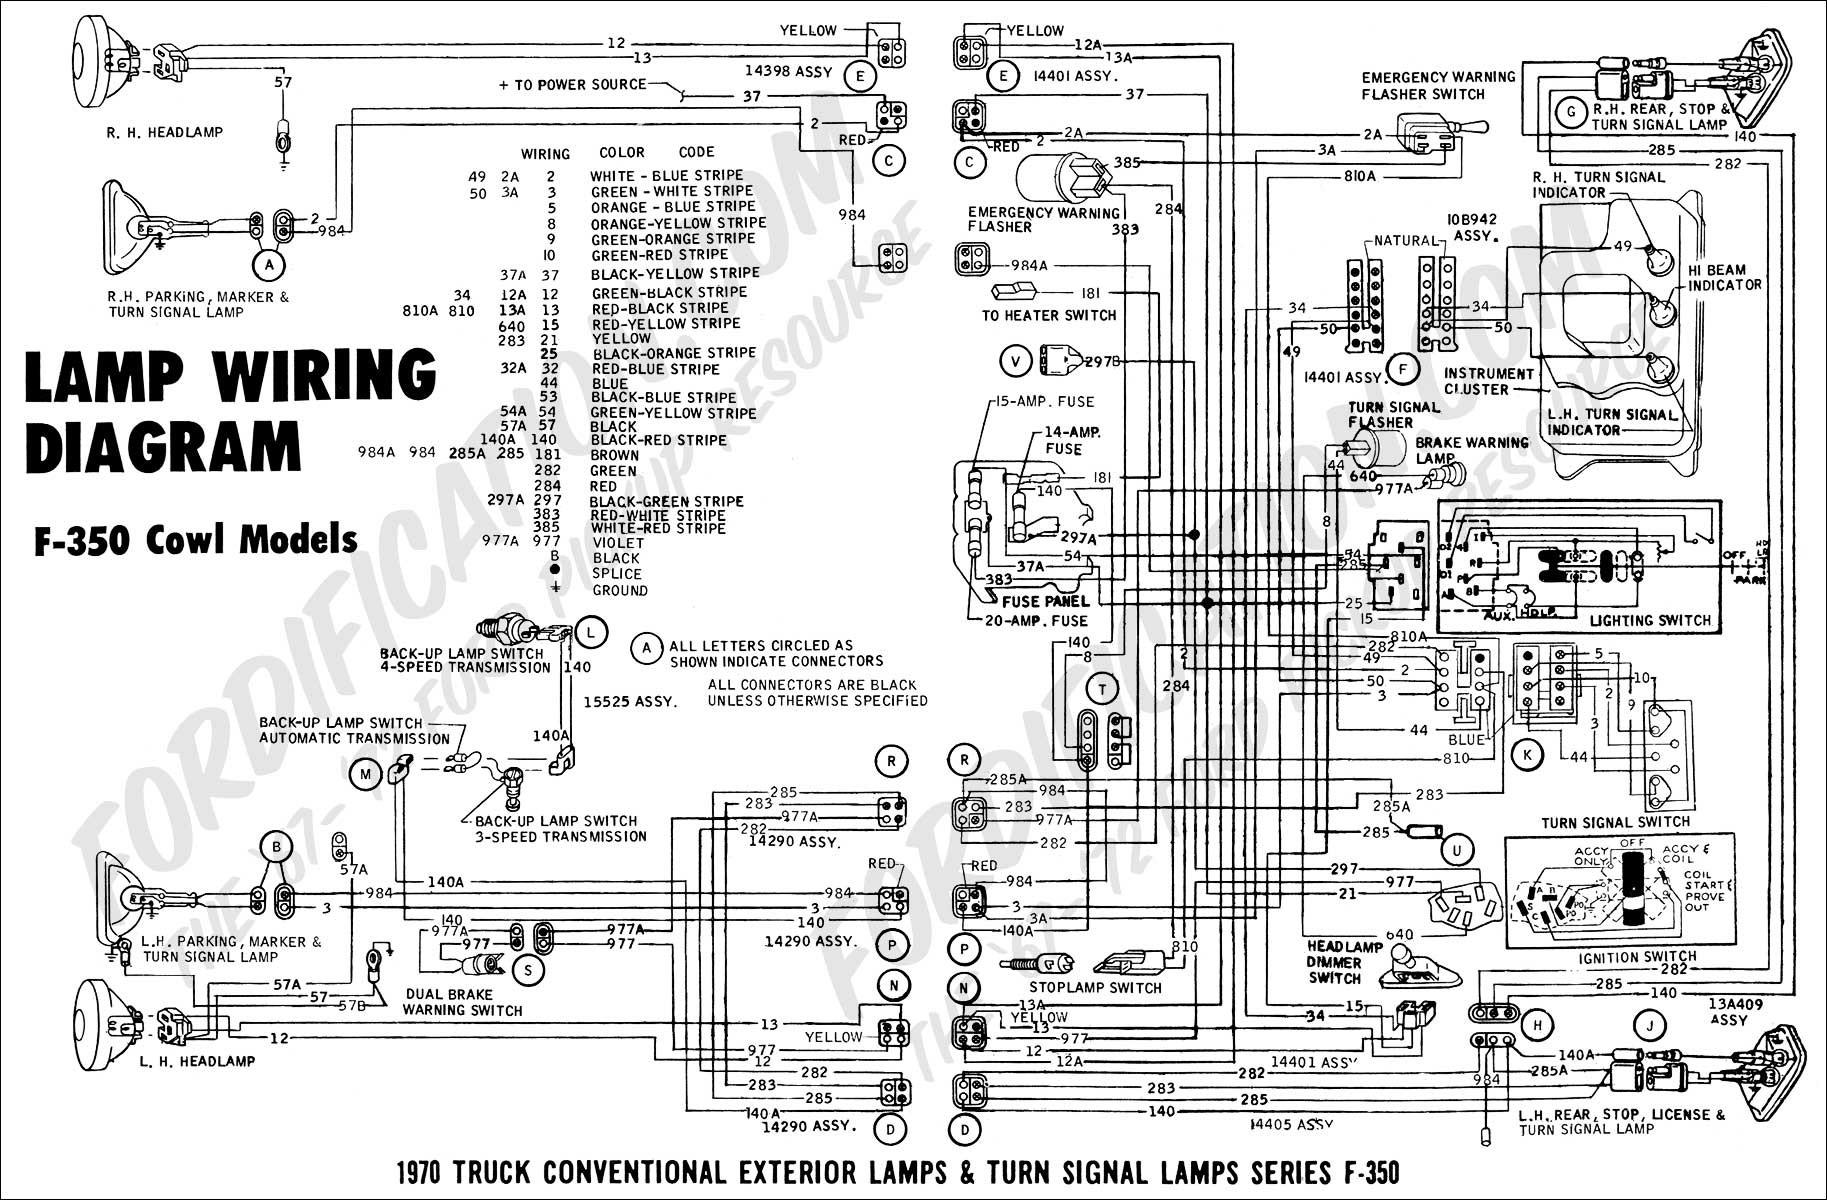 1986 ford F350 Wiring Diagram ford F350 Wiring Diagram 1 Lenito Of 1986 ford F350 Wiring Diagram